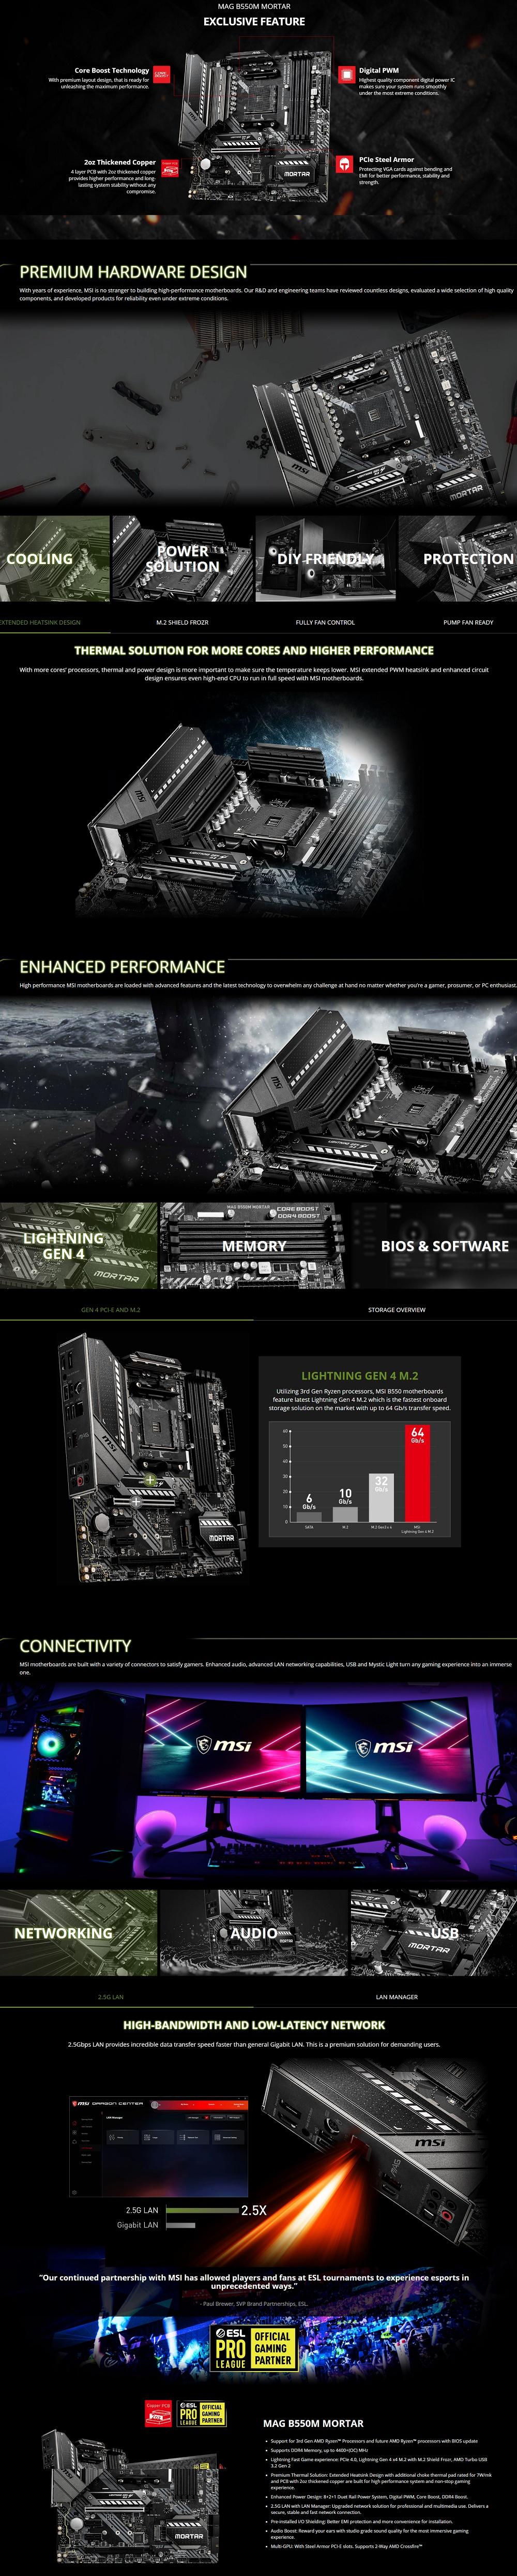 MSI MAG B550M MORTAR AM4 mATX motherboard 6